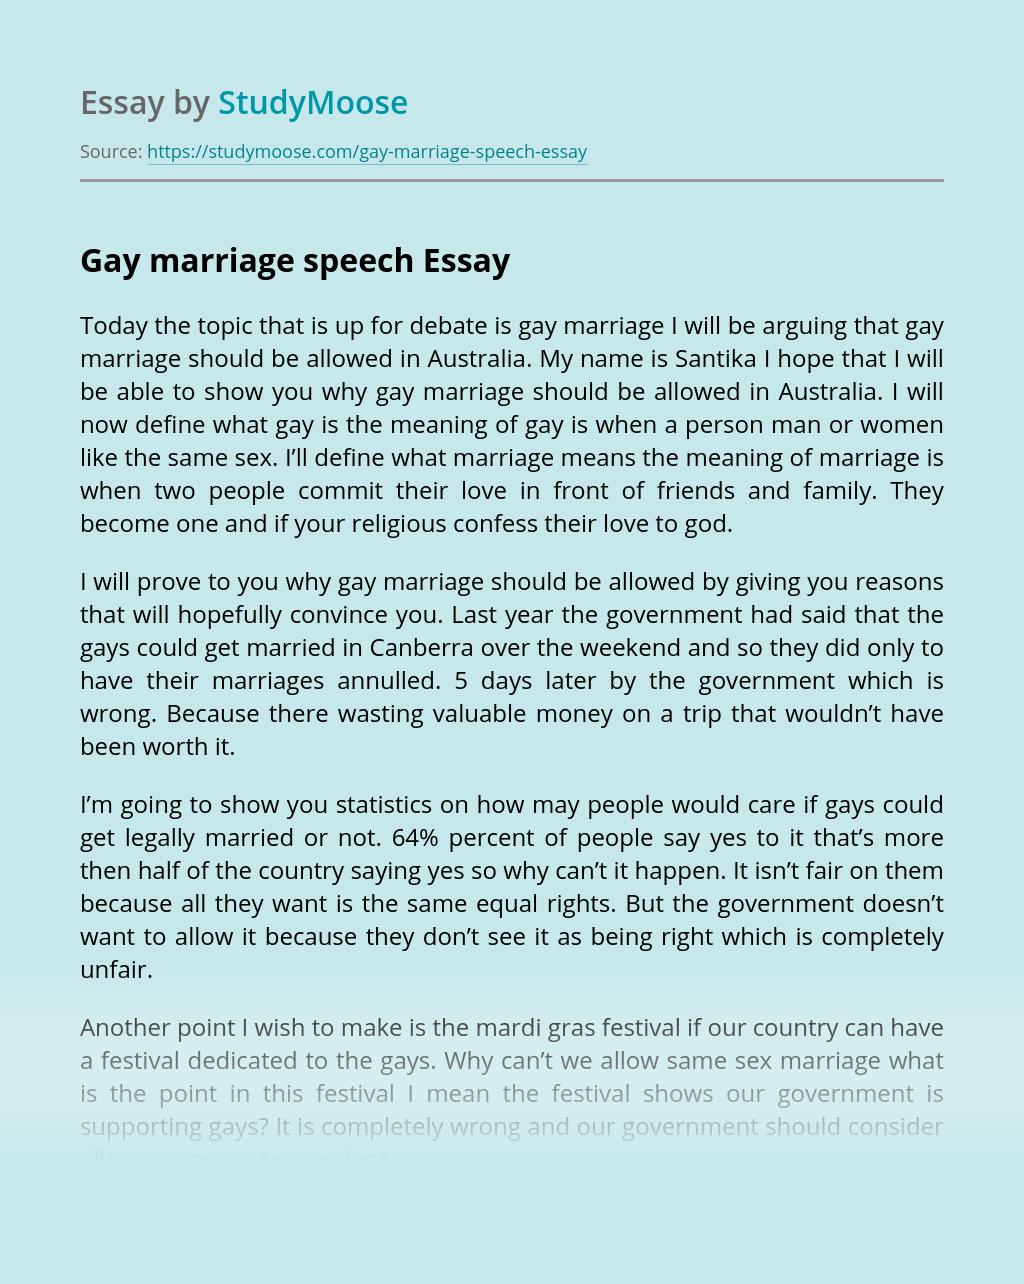 Gay marriage speech